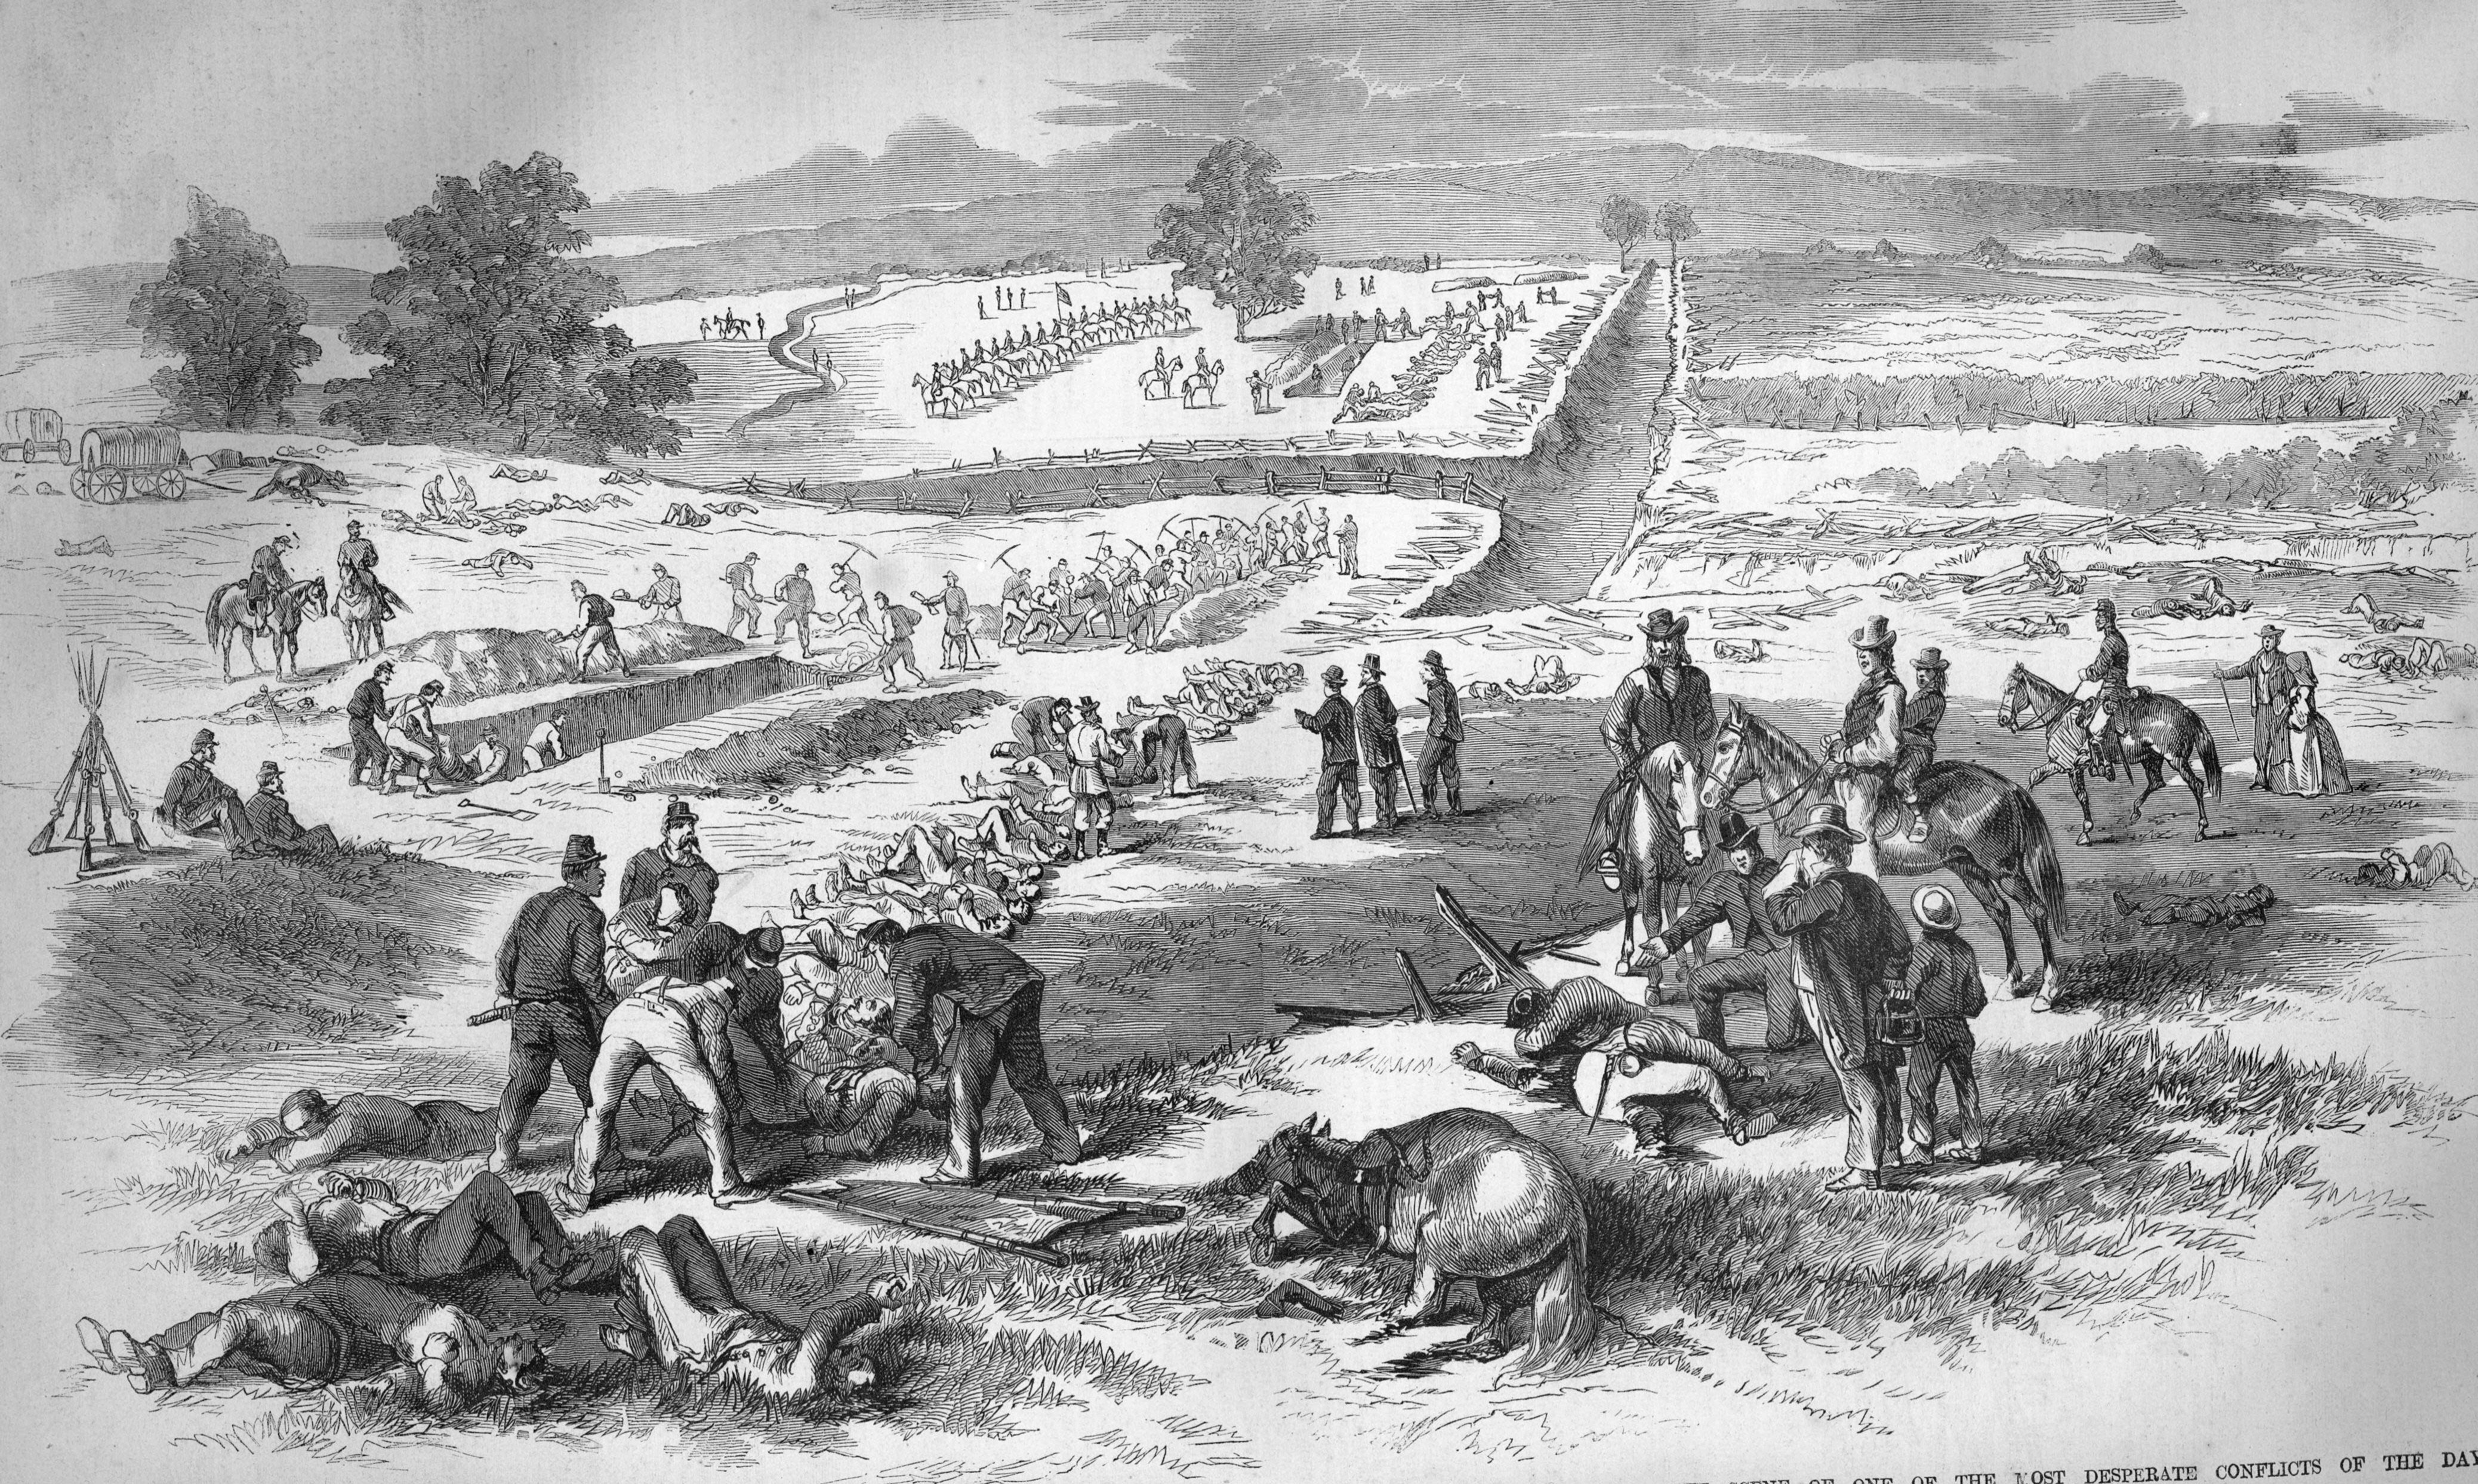 Burying union dead on the antietam battlefield 1862 civil war